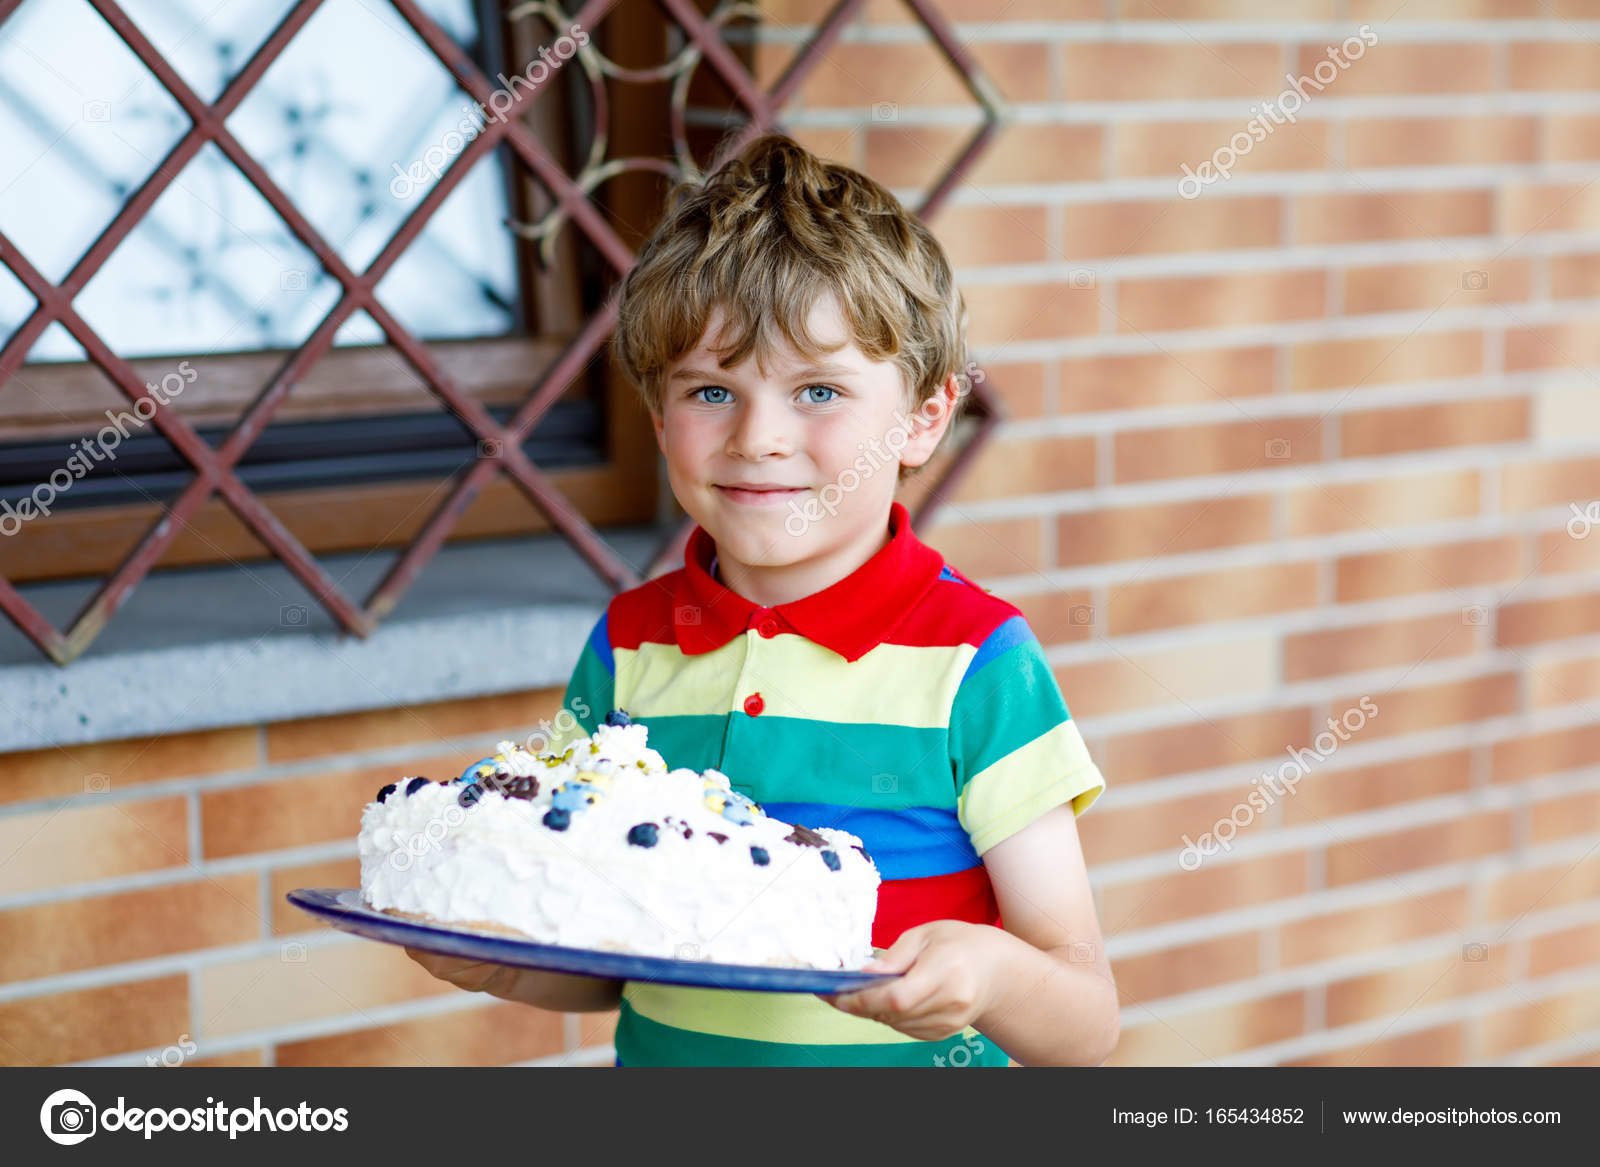 Cute blond kid boy holding big birthday cake Happy smiling child